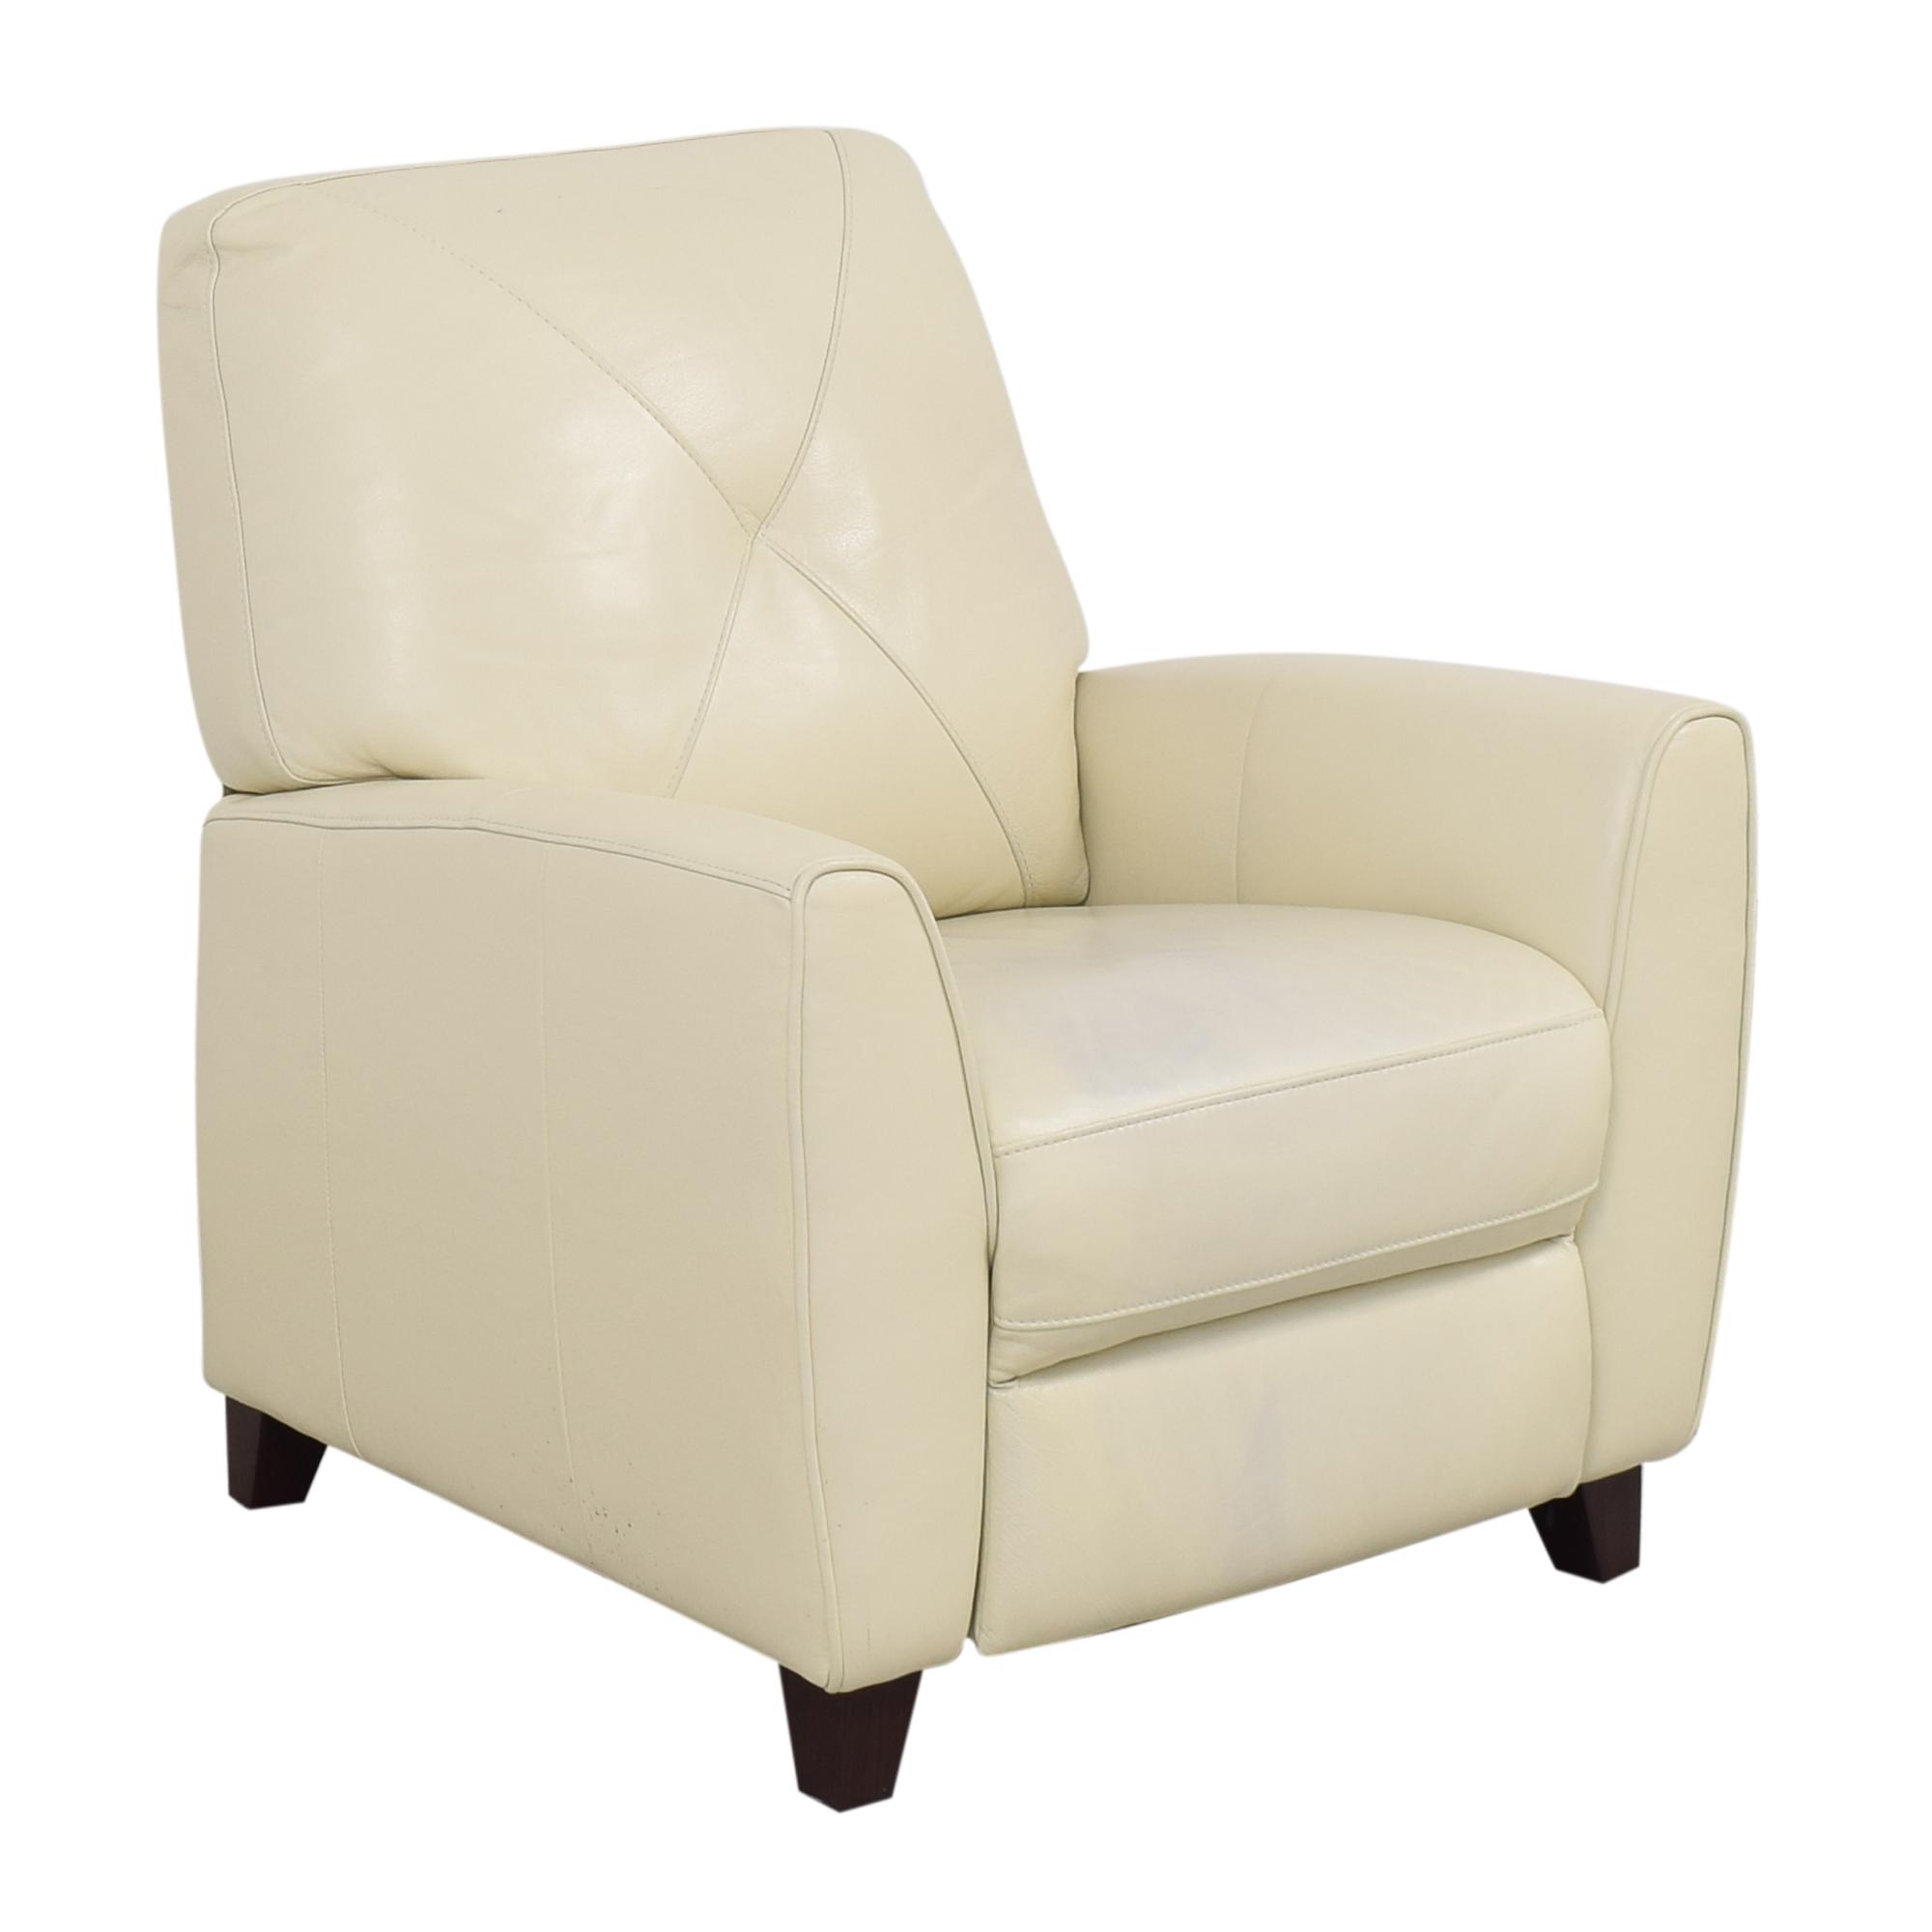 Macy's Macy's Myia Pushback Reclining Chair ct